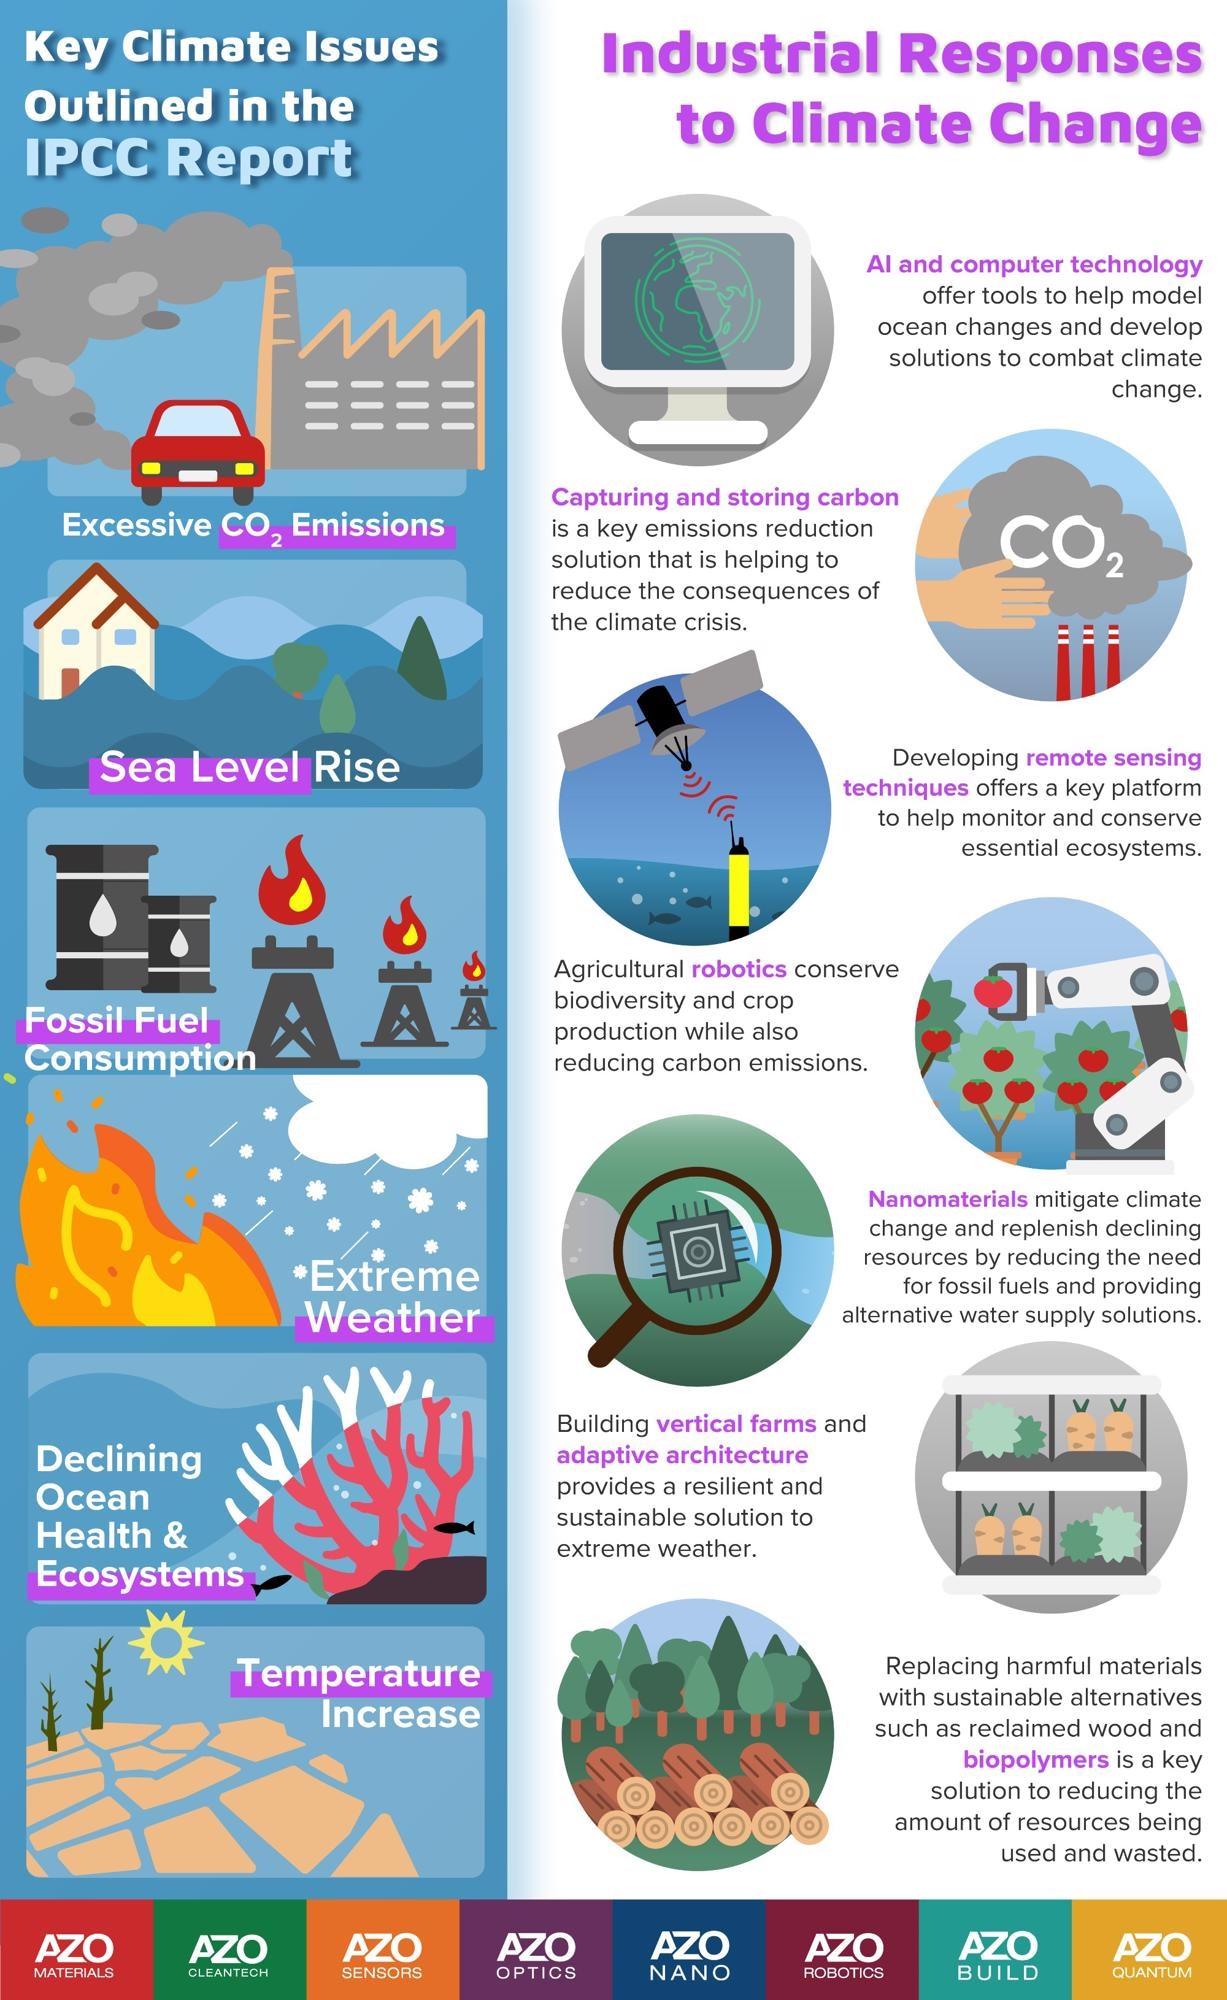 AZo Network AZo Robotics IPCC Industrial Response to Climate Change Infographic